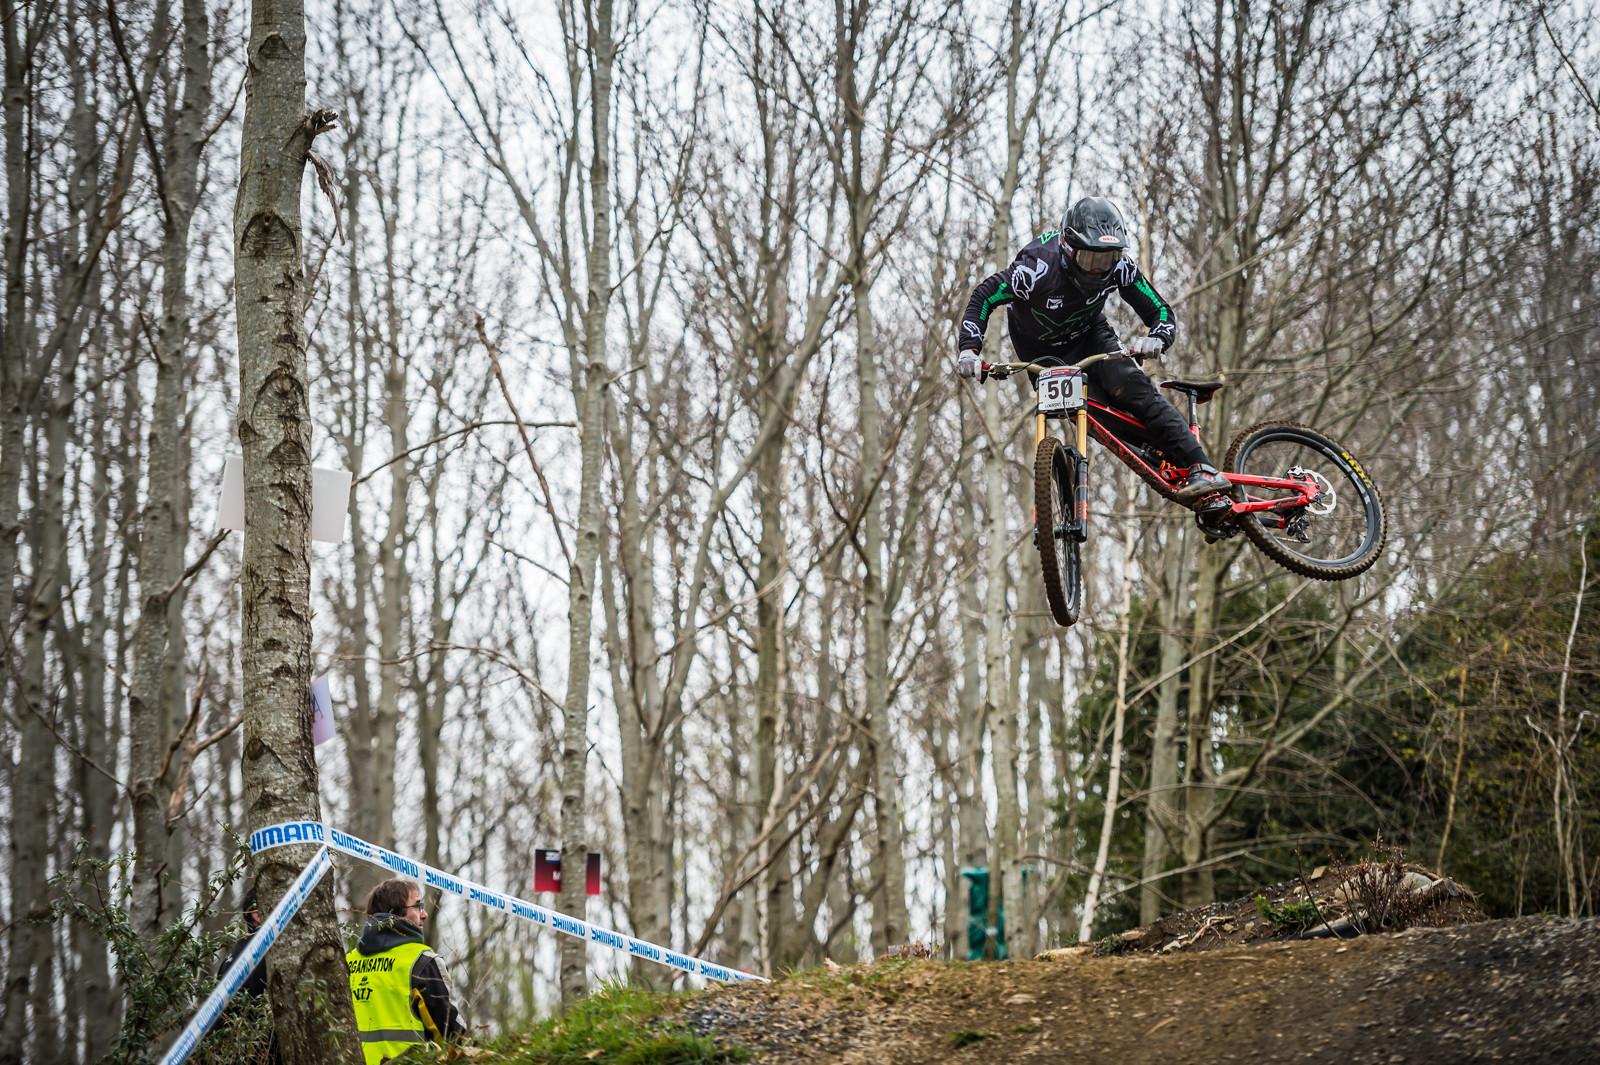 Angel Suarez - iceman2058 - Mountain Biking Pictures - Vital MTB